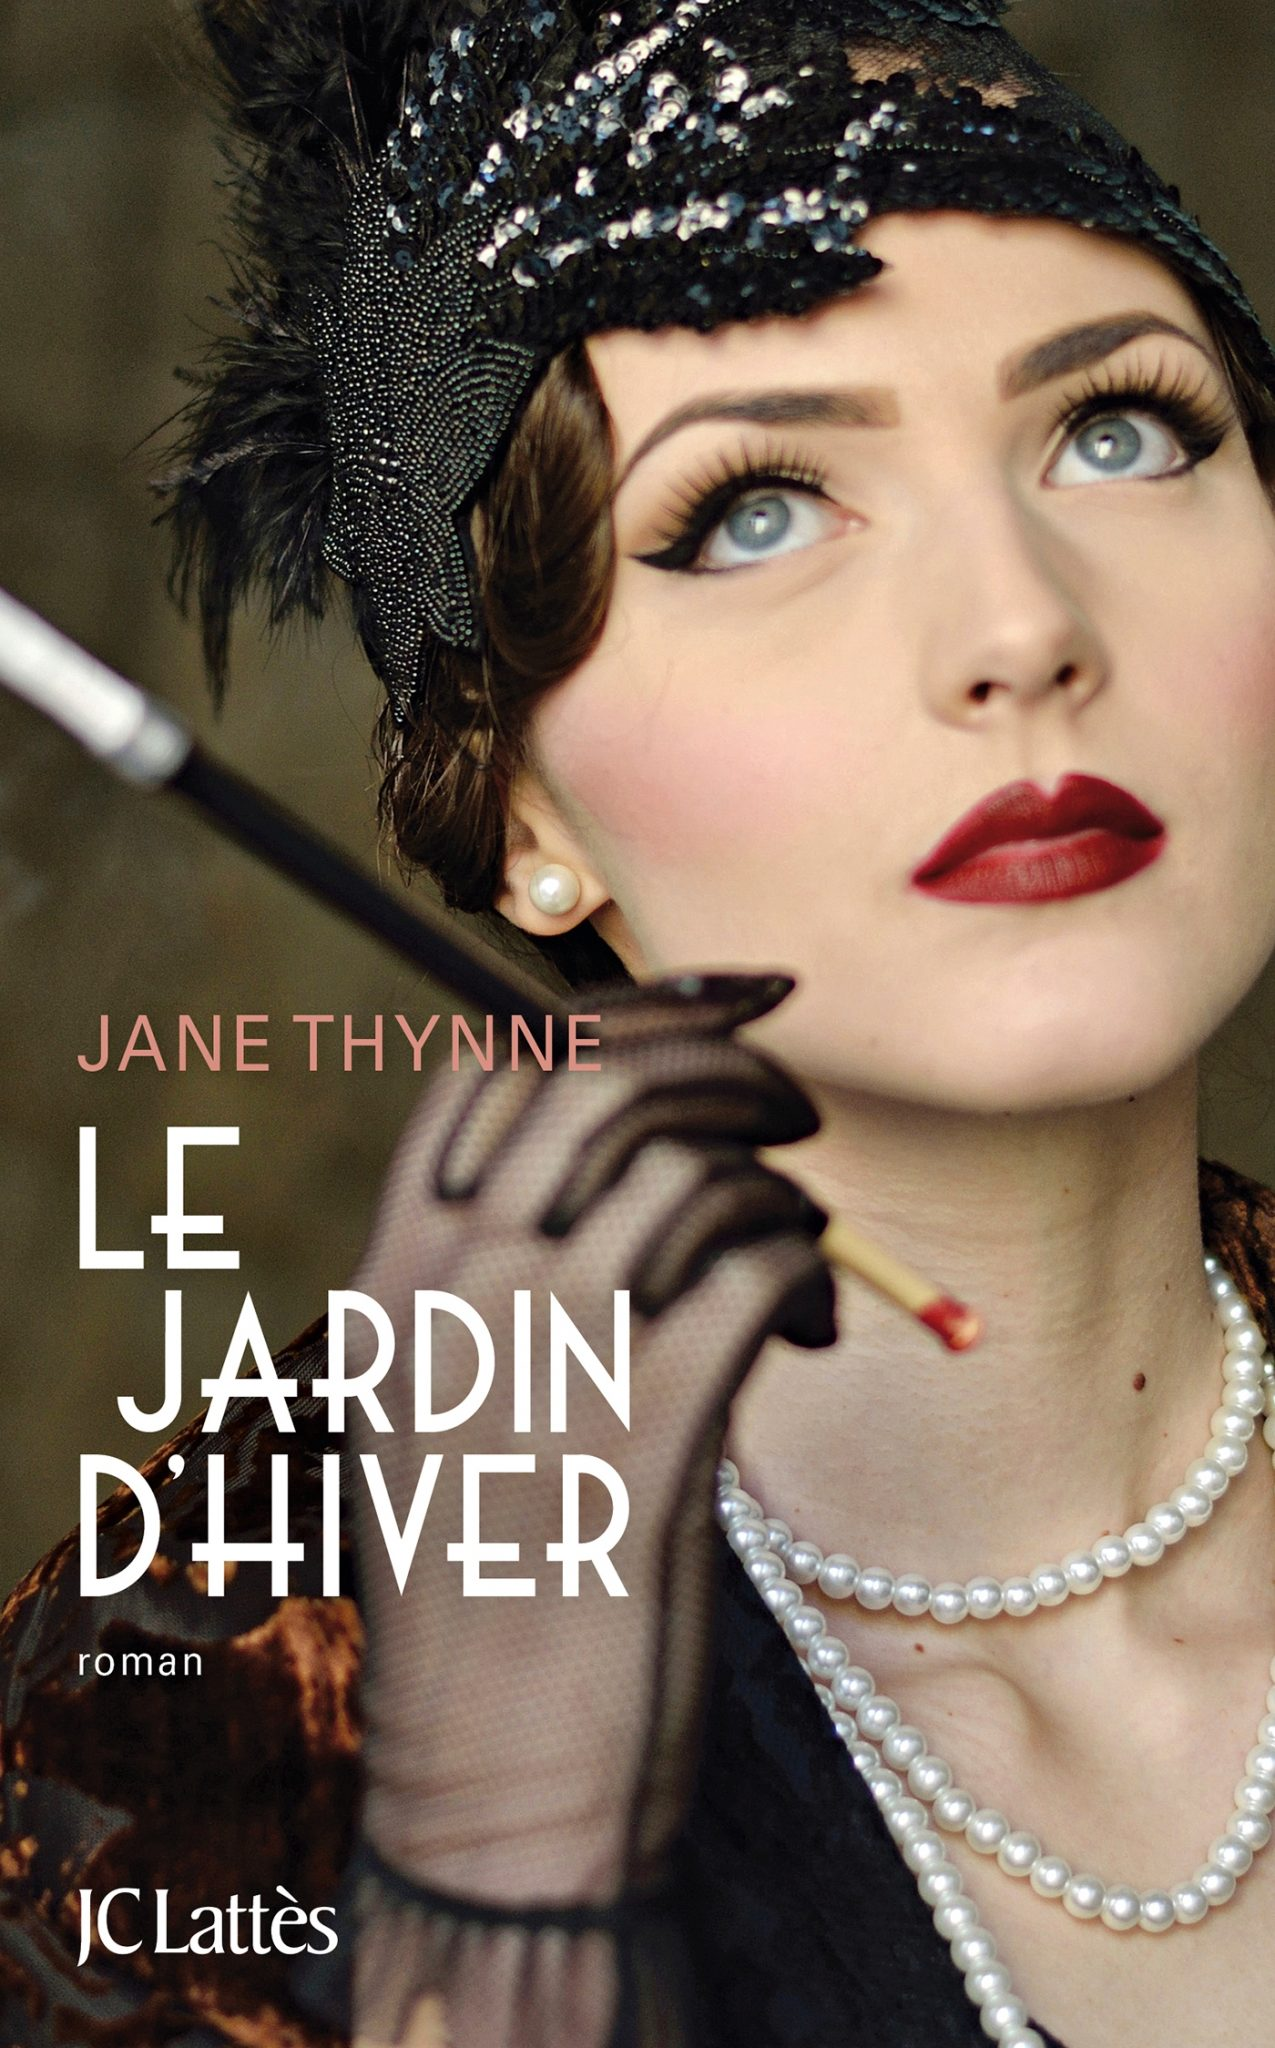 Le Jardin d'hiver, Jane Thynne, JC Lattès